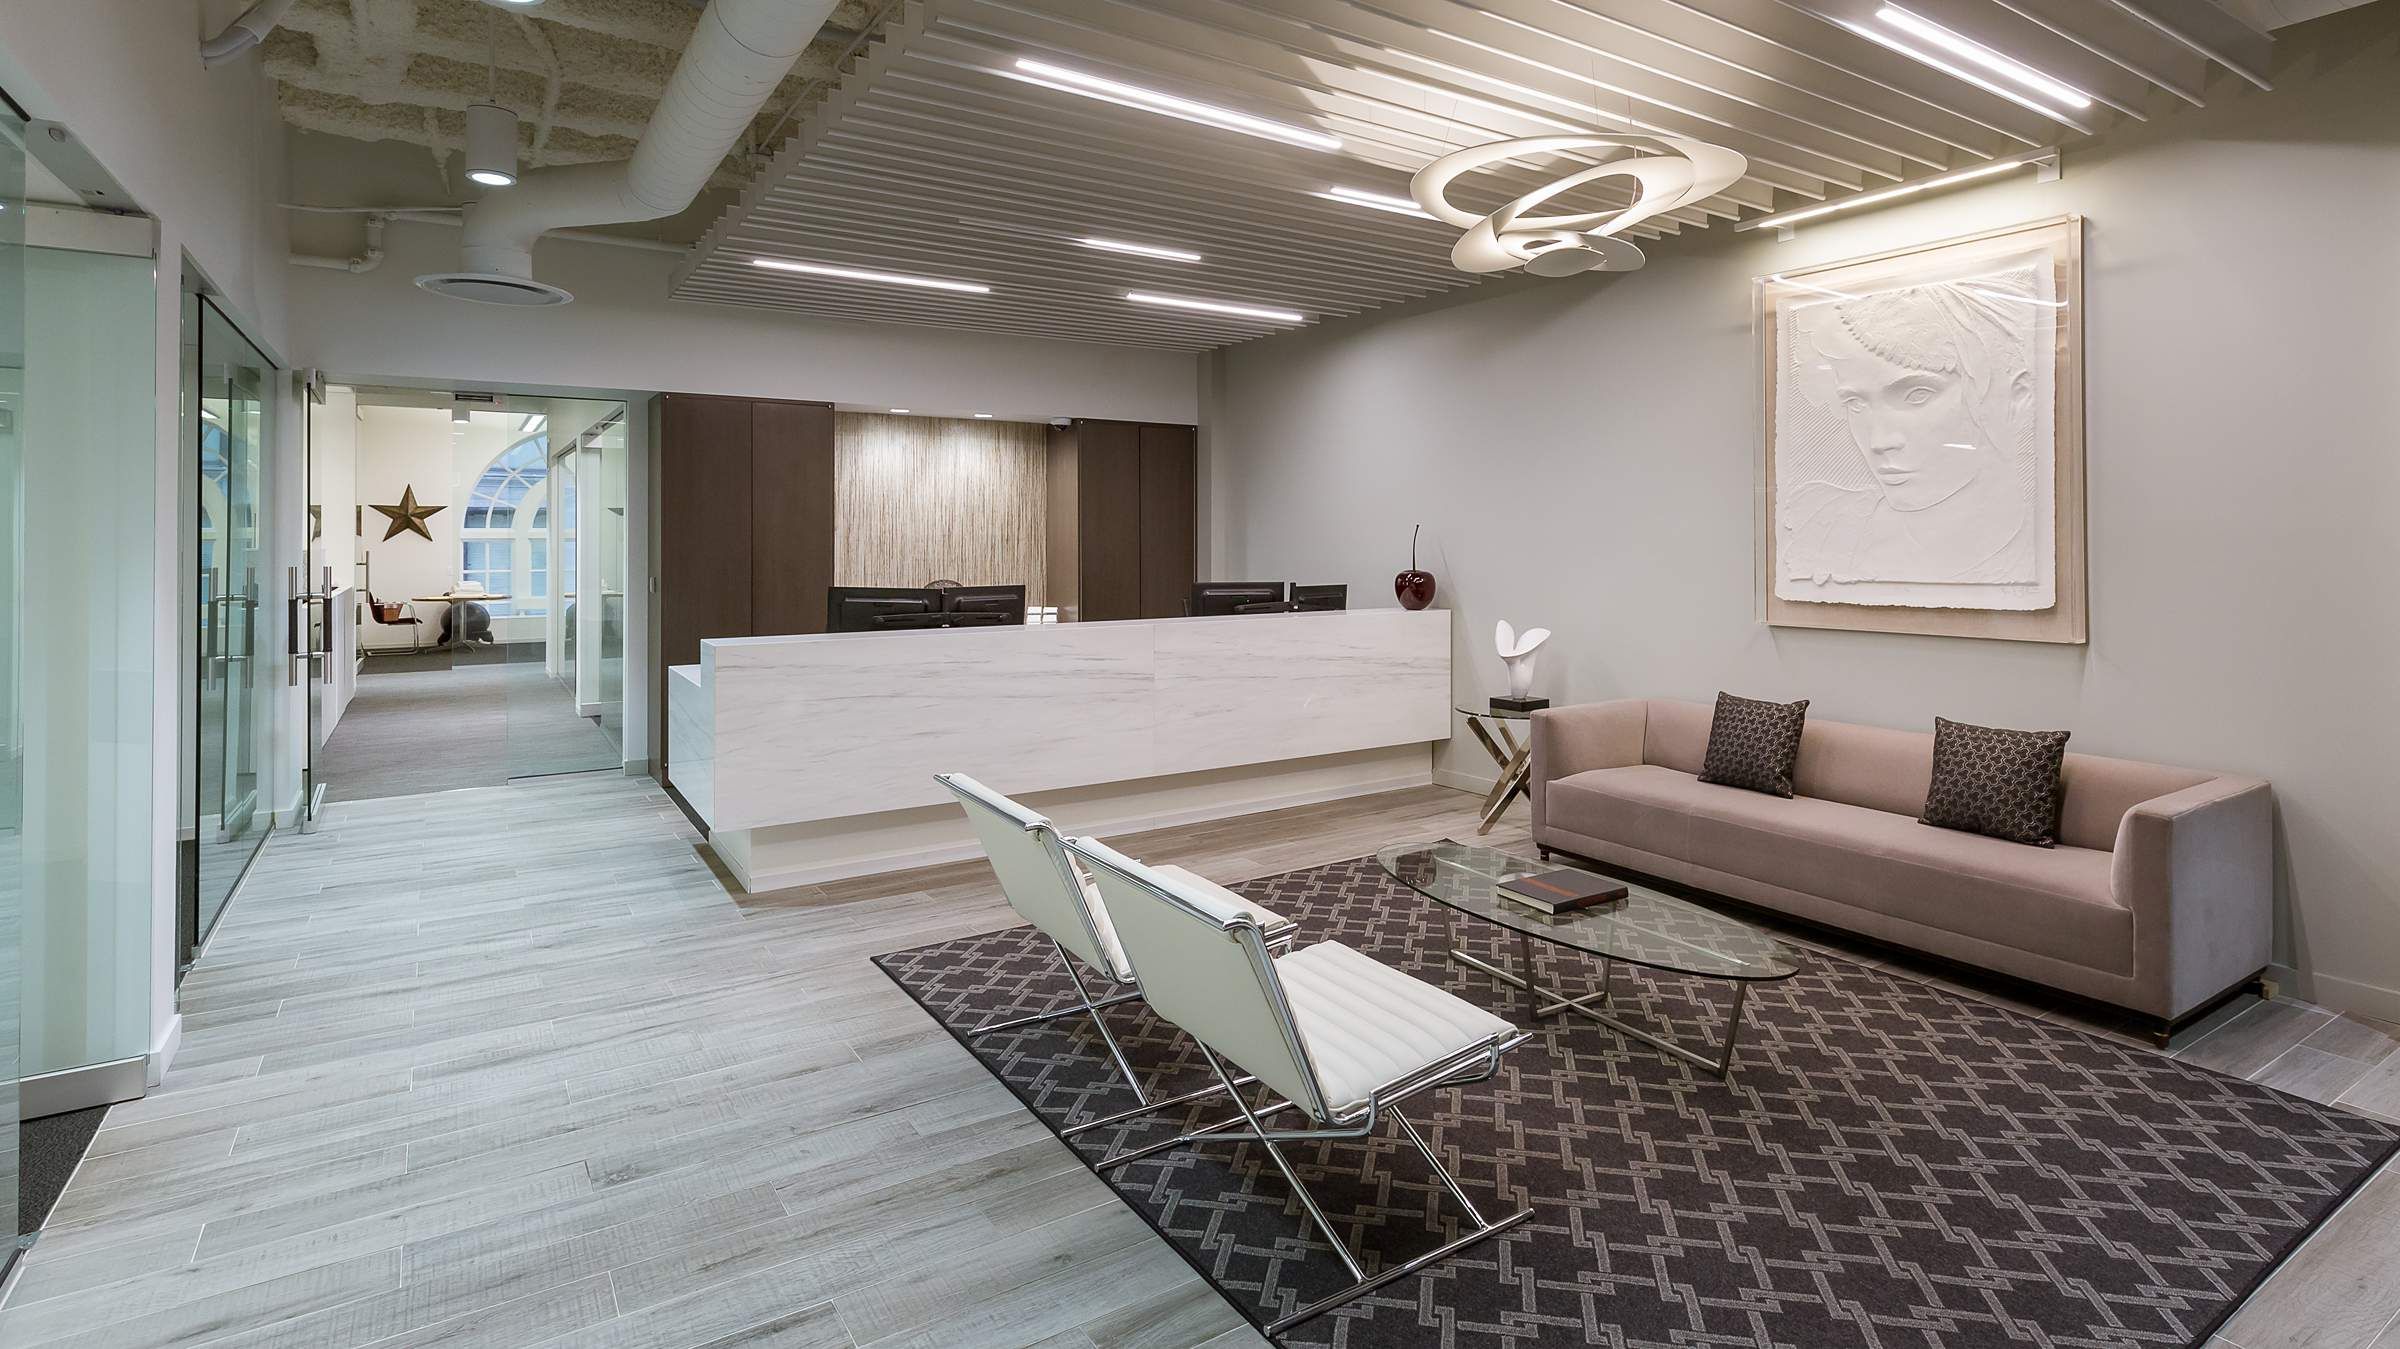 Google 360 examples professional offices walkthru360 - Top interior design firms chicago ...